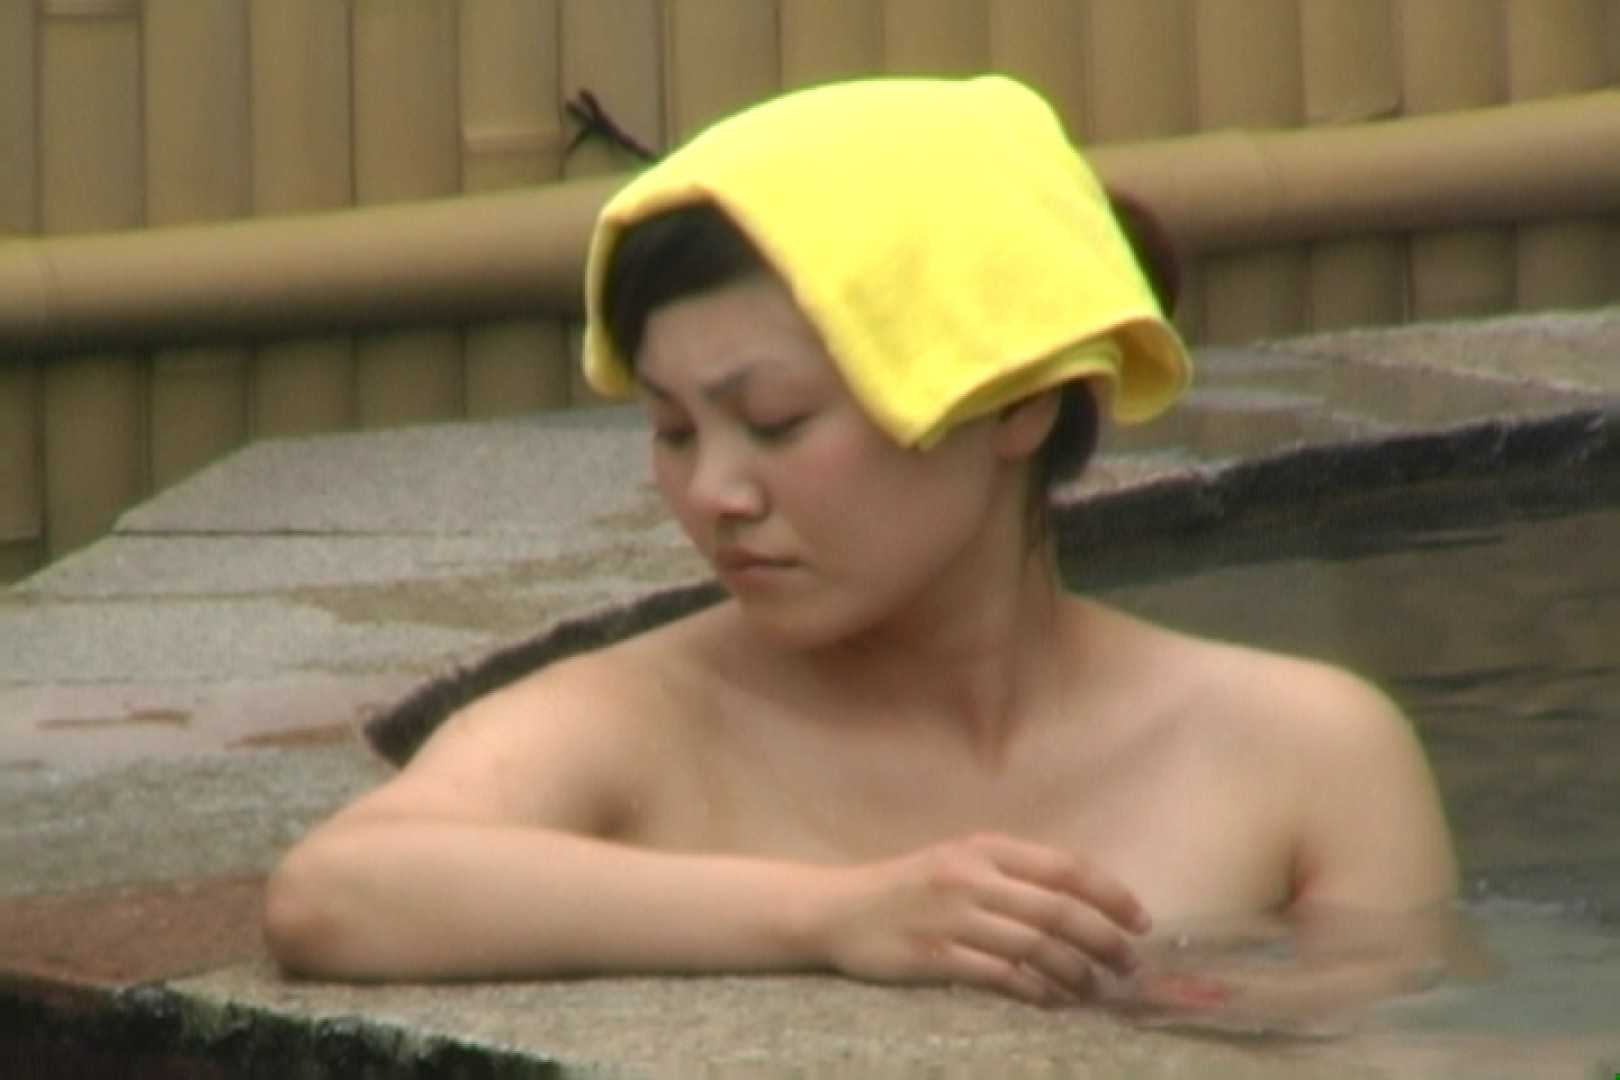 Aquaな露天風呂Vol.621 露天風呂編 | 盗撮シリーズ  106PIX 63